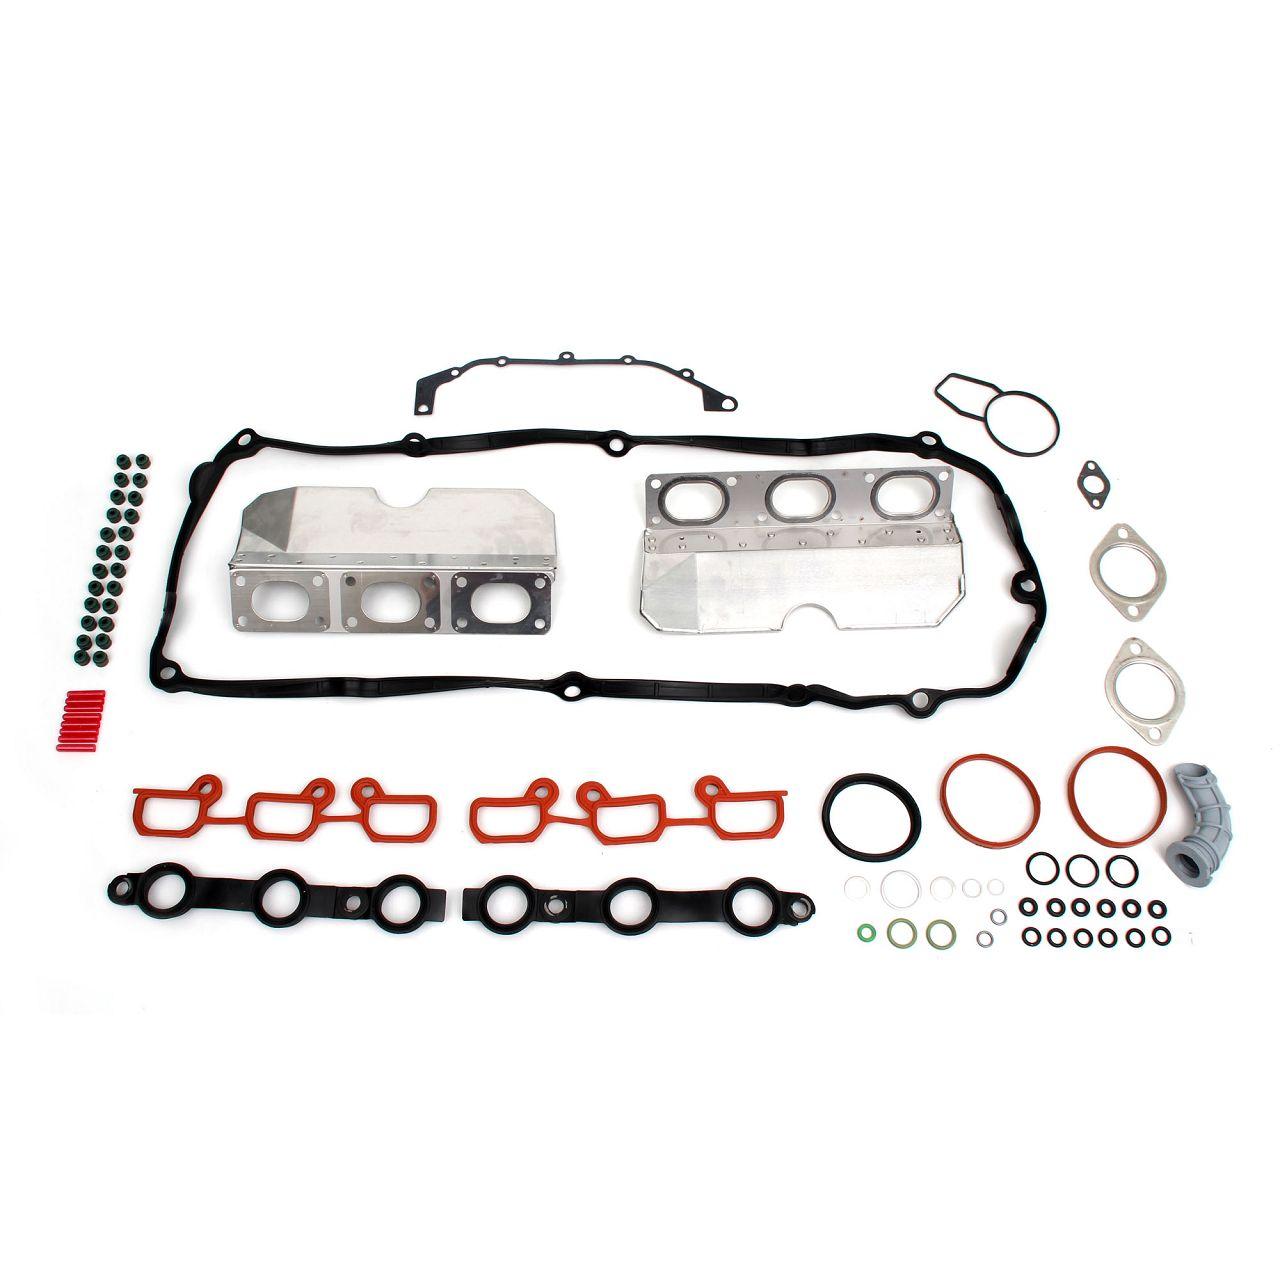 ELRING Zylinderkopfdichtung + Schraubensatz für BMW E46 E39 E60 E61 E65-67 M54